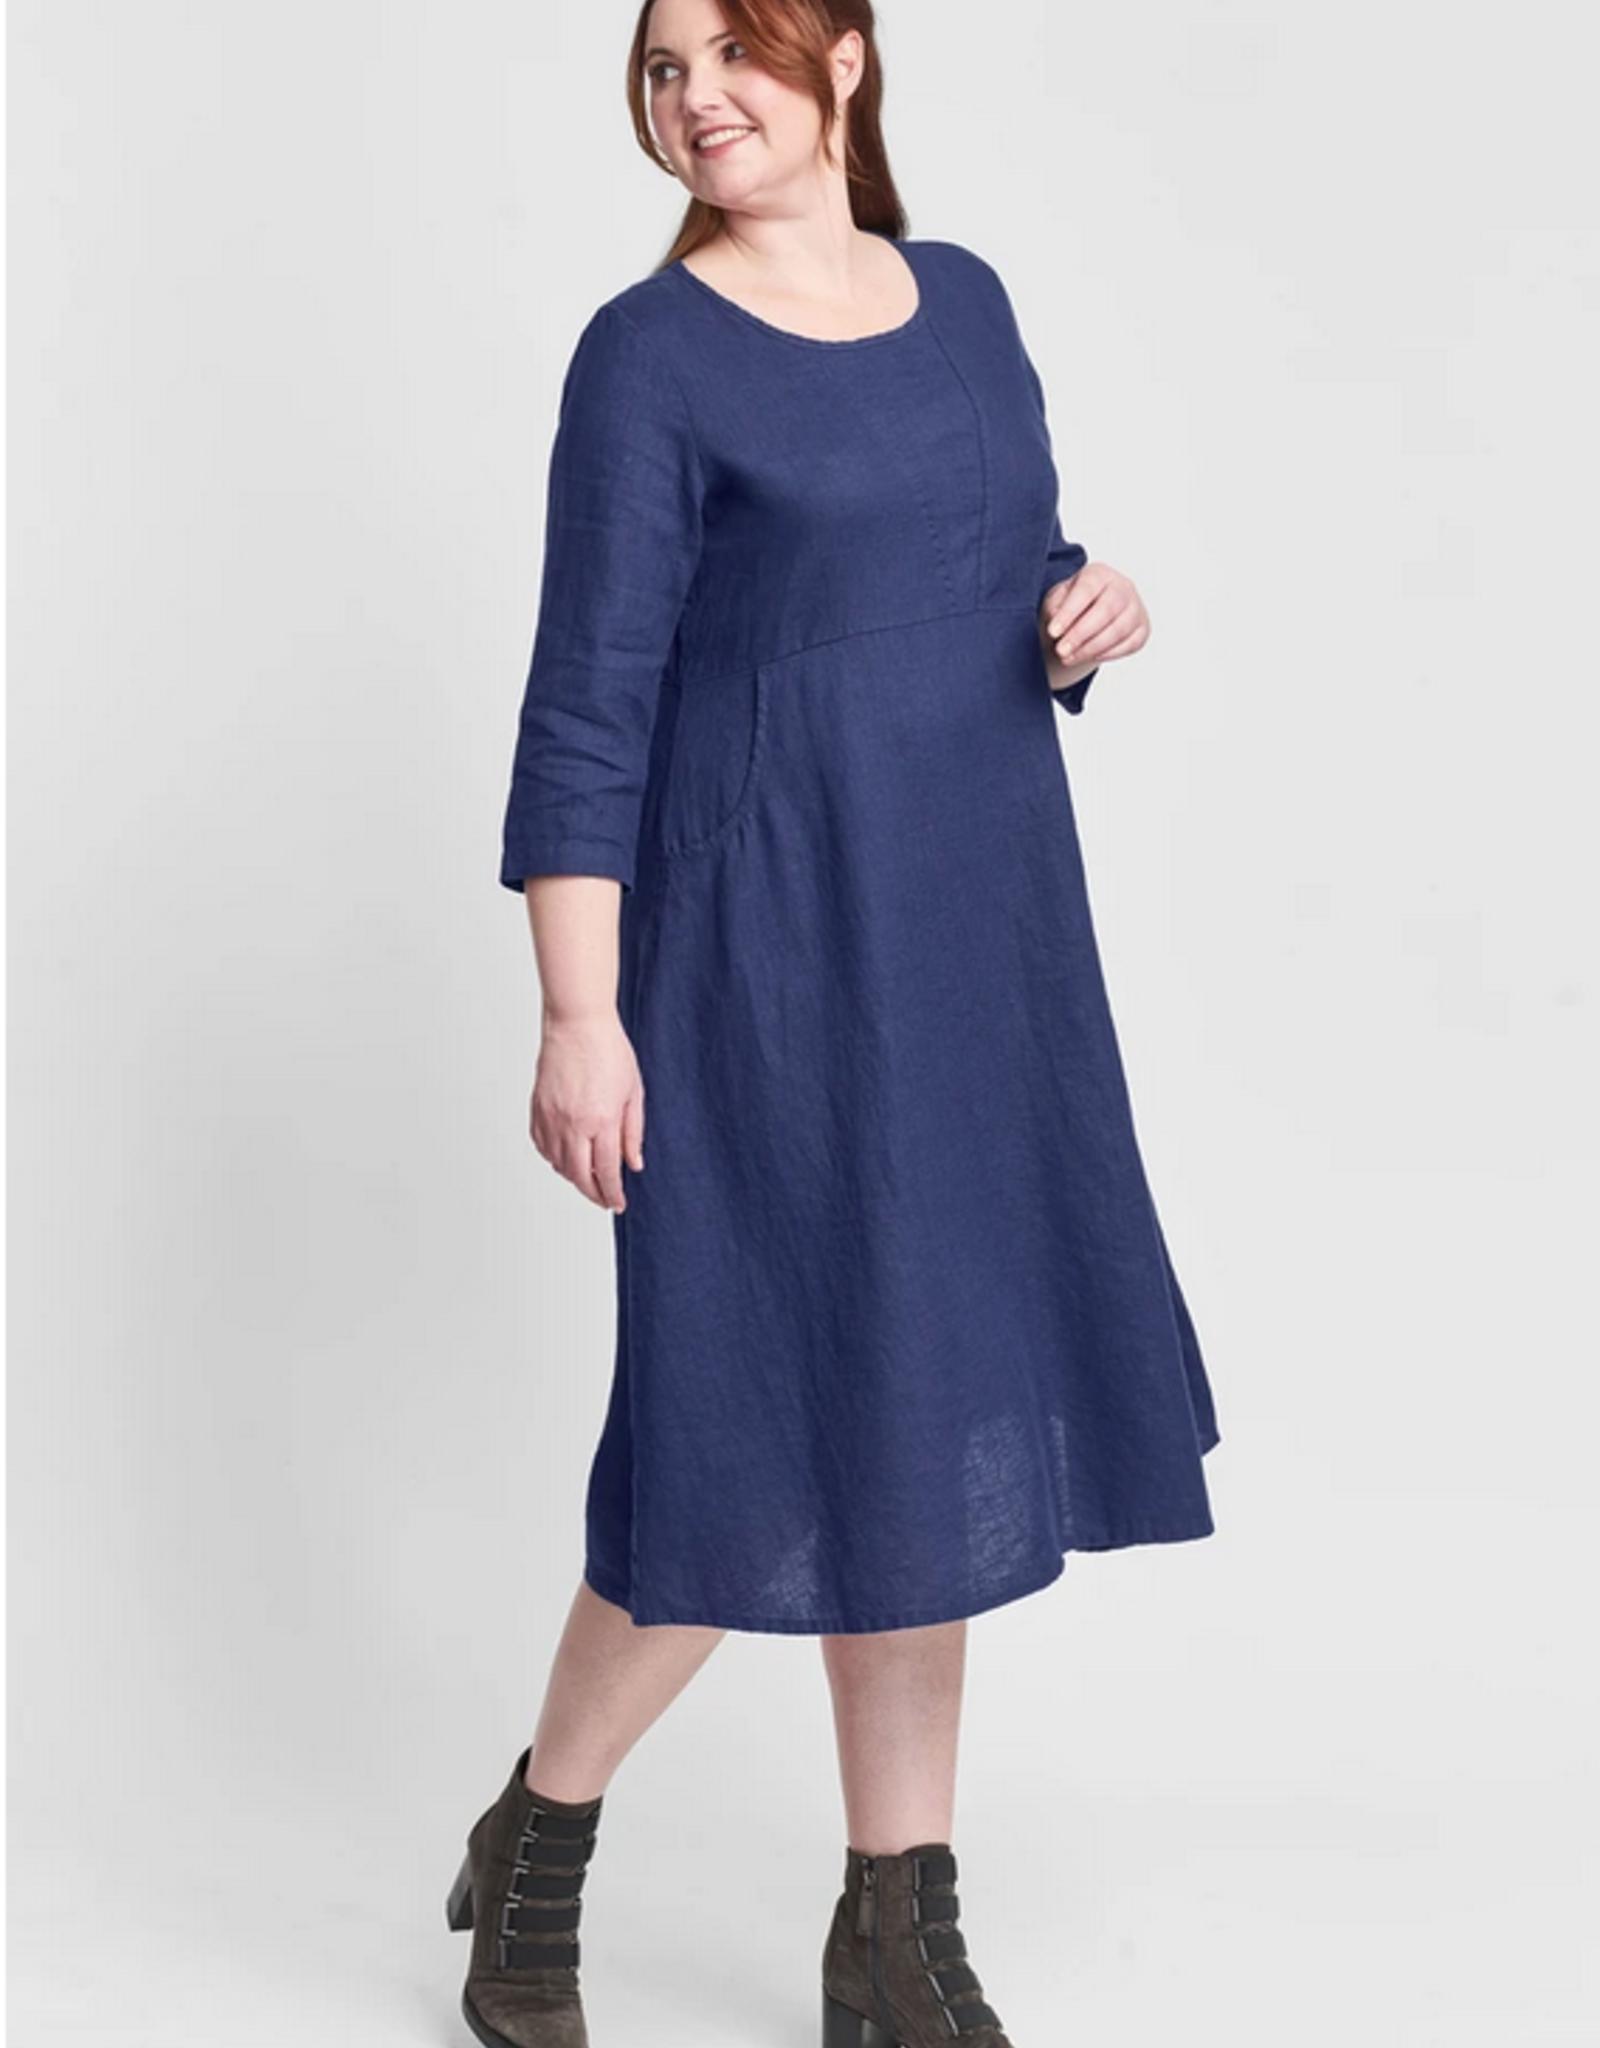 Flax Flax Dashing Dress Sapphire